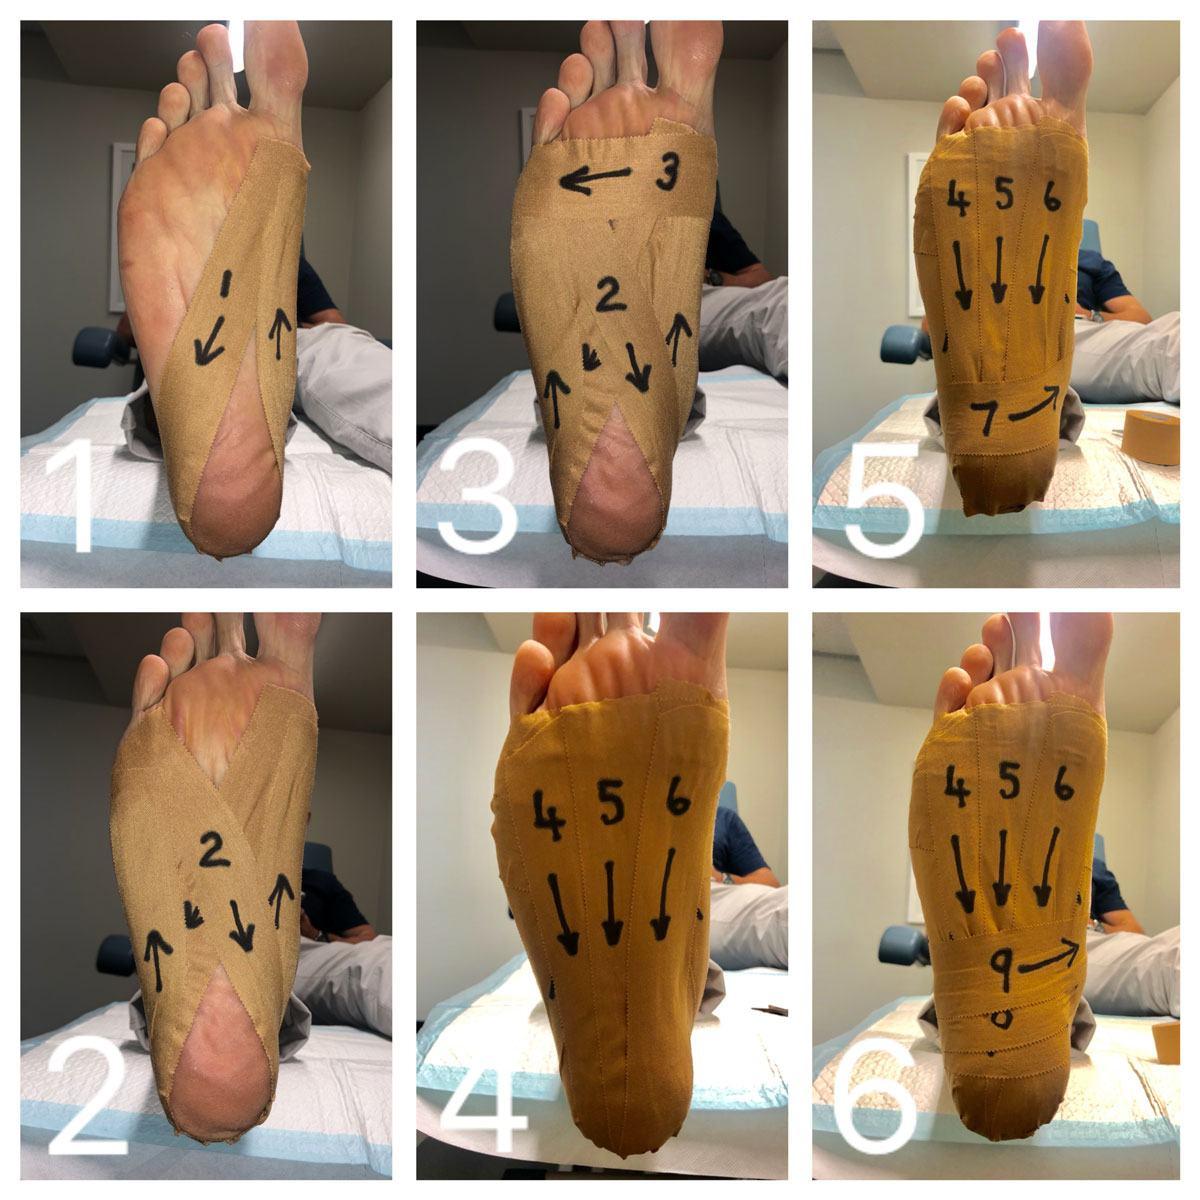 for plantar fasciitis/heel pain